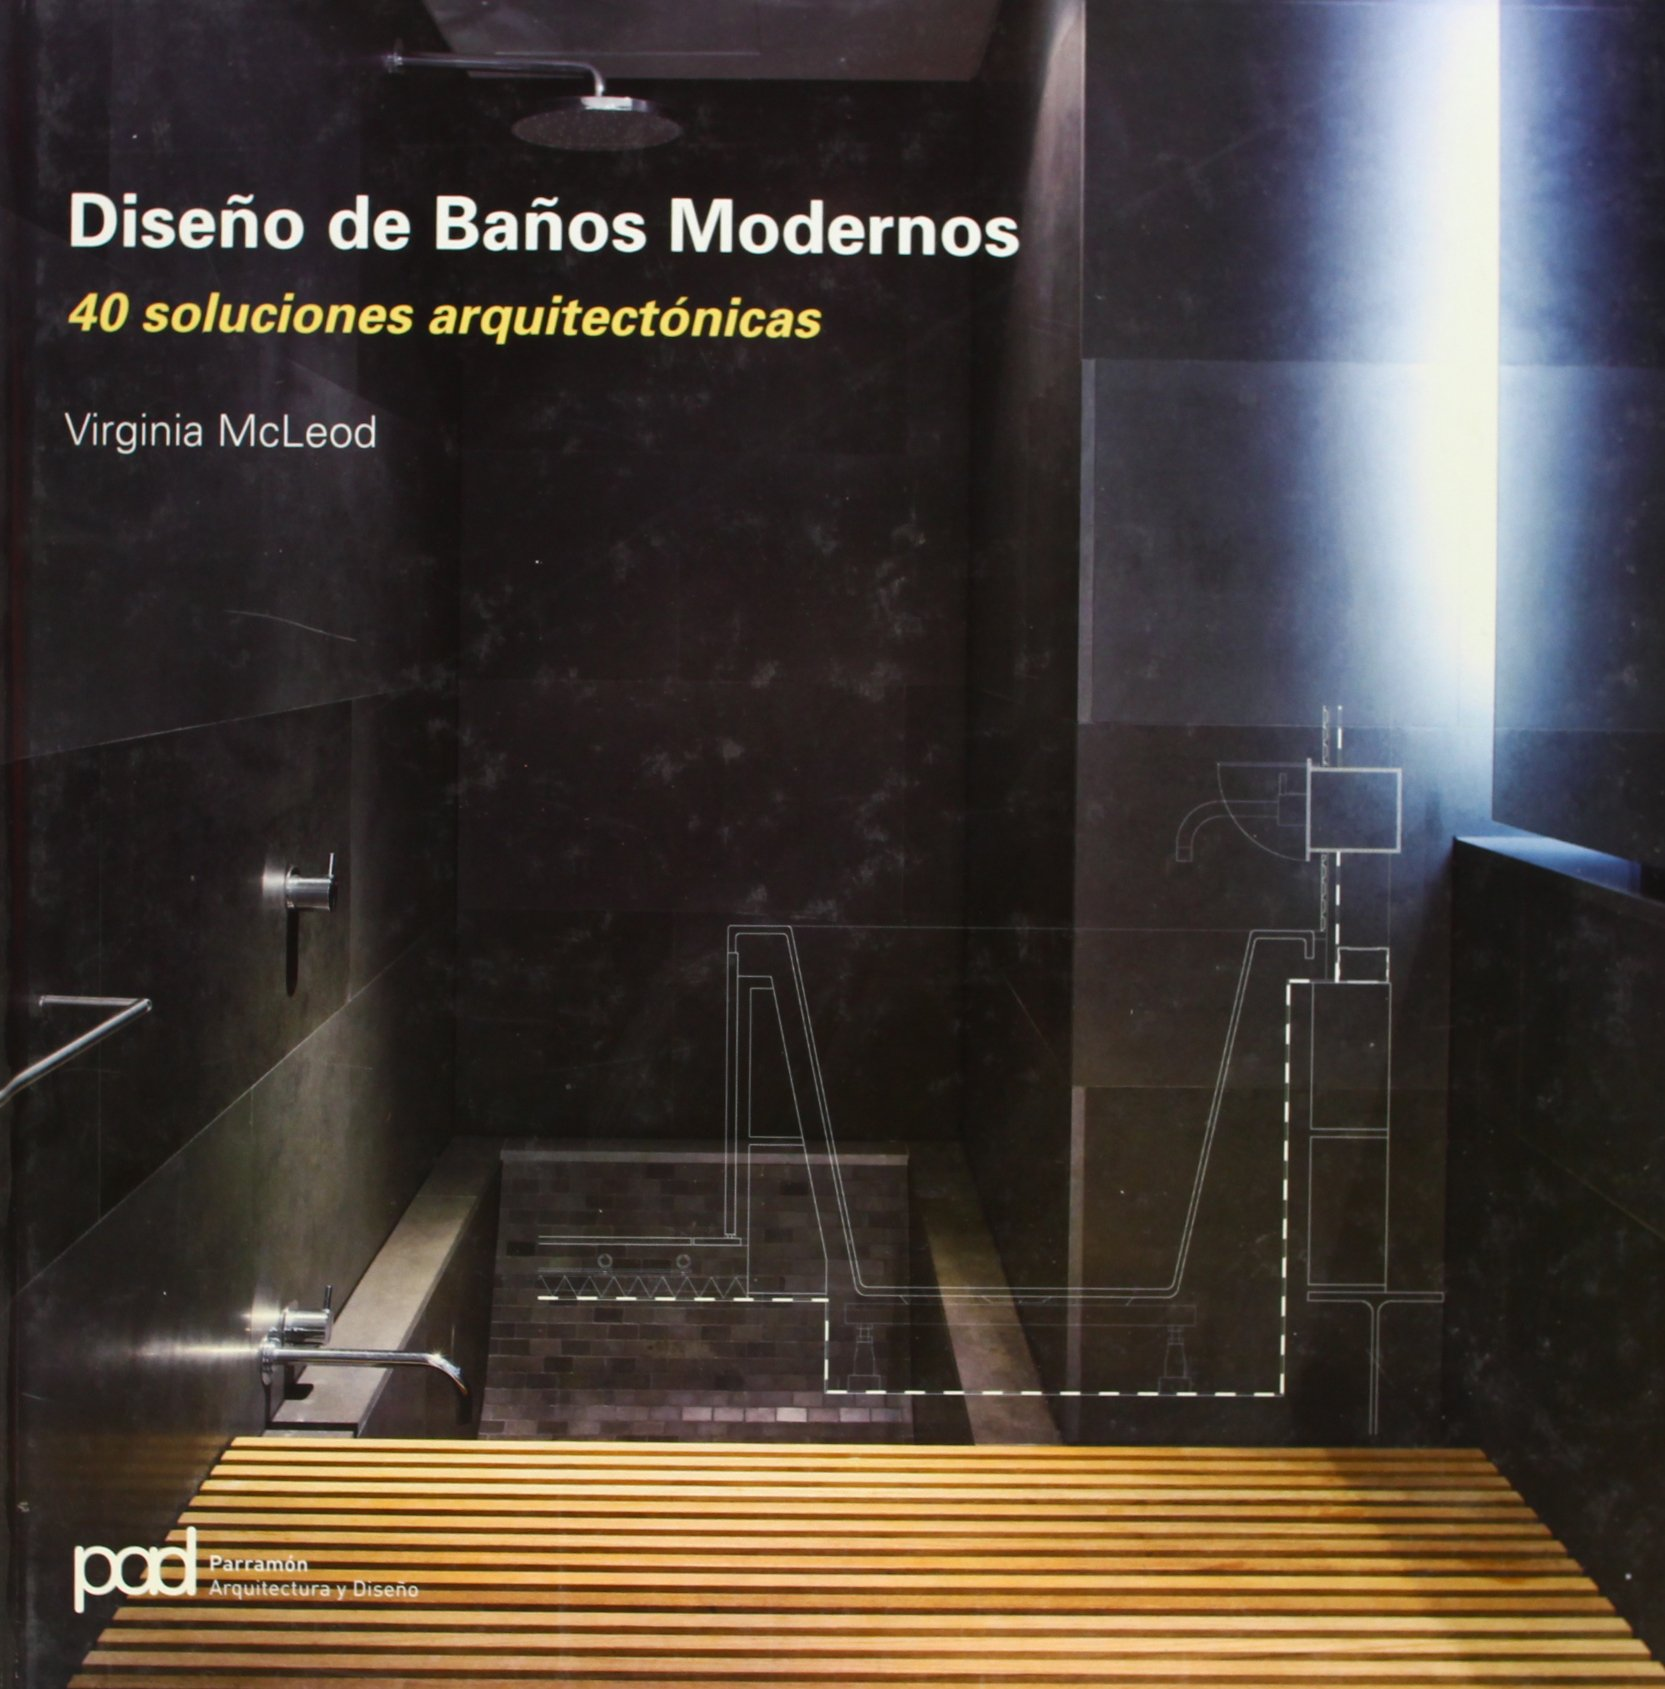 DISEÑO DE COCINAS MODERNAS Arquitectura contemporanea: Amazon.es ...